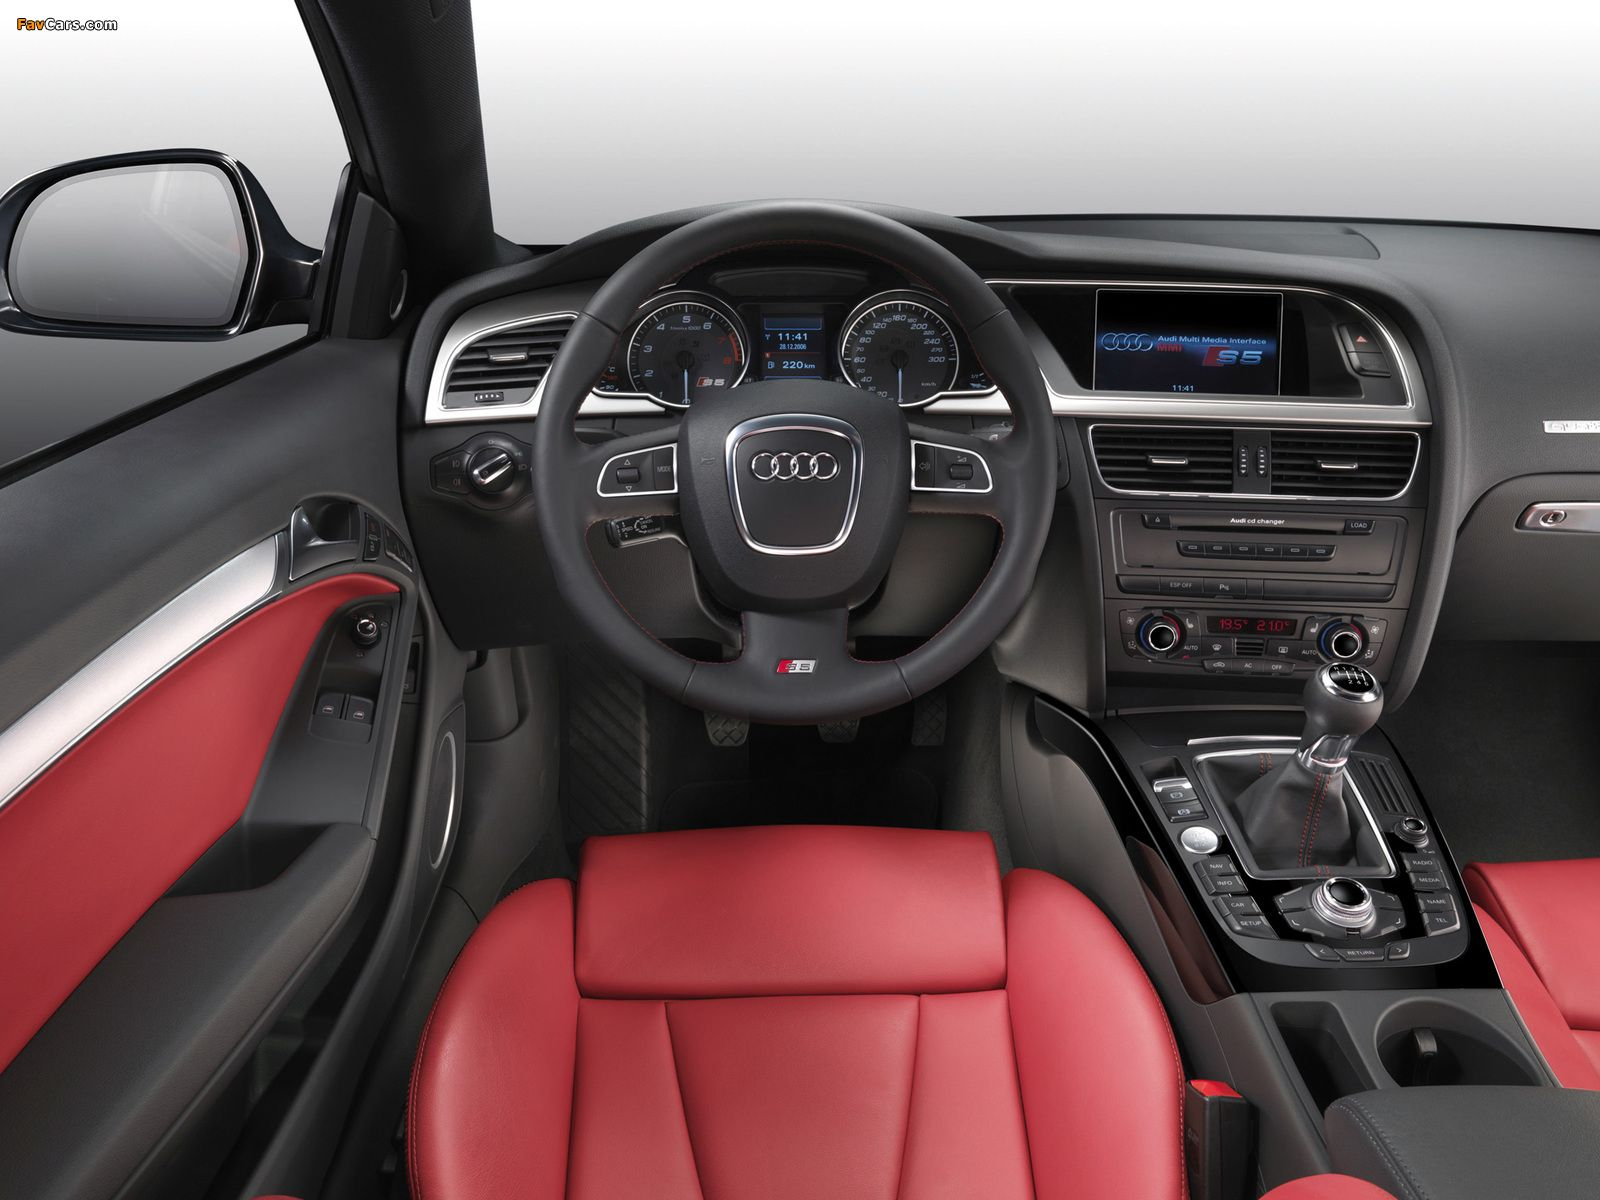 Audi S5 Coupe 2008 11 Audi S5 Audi Luxury Car Interior